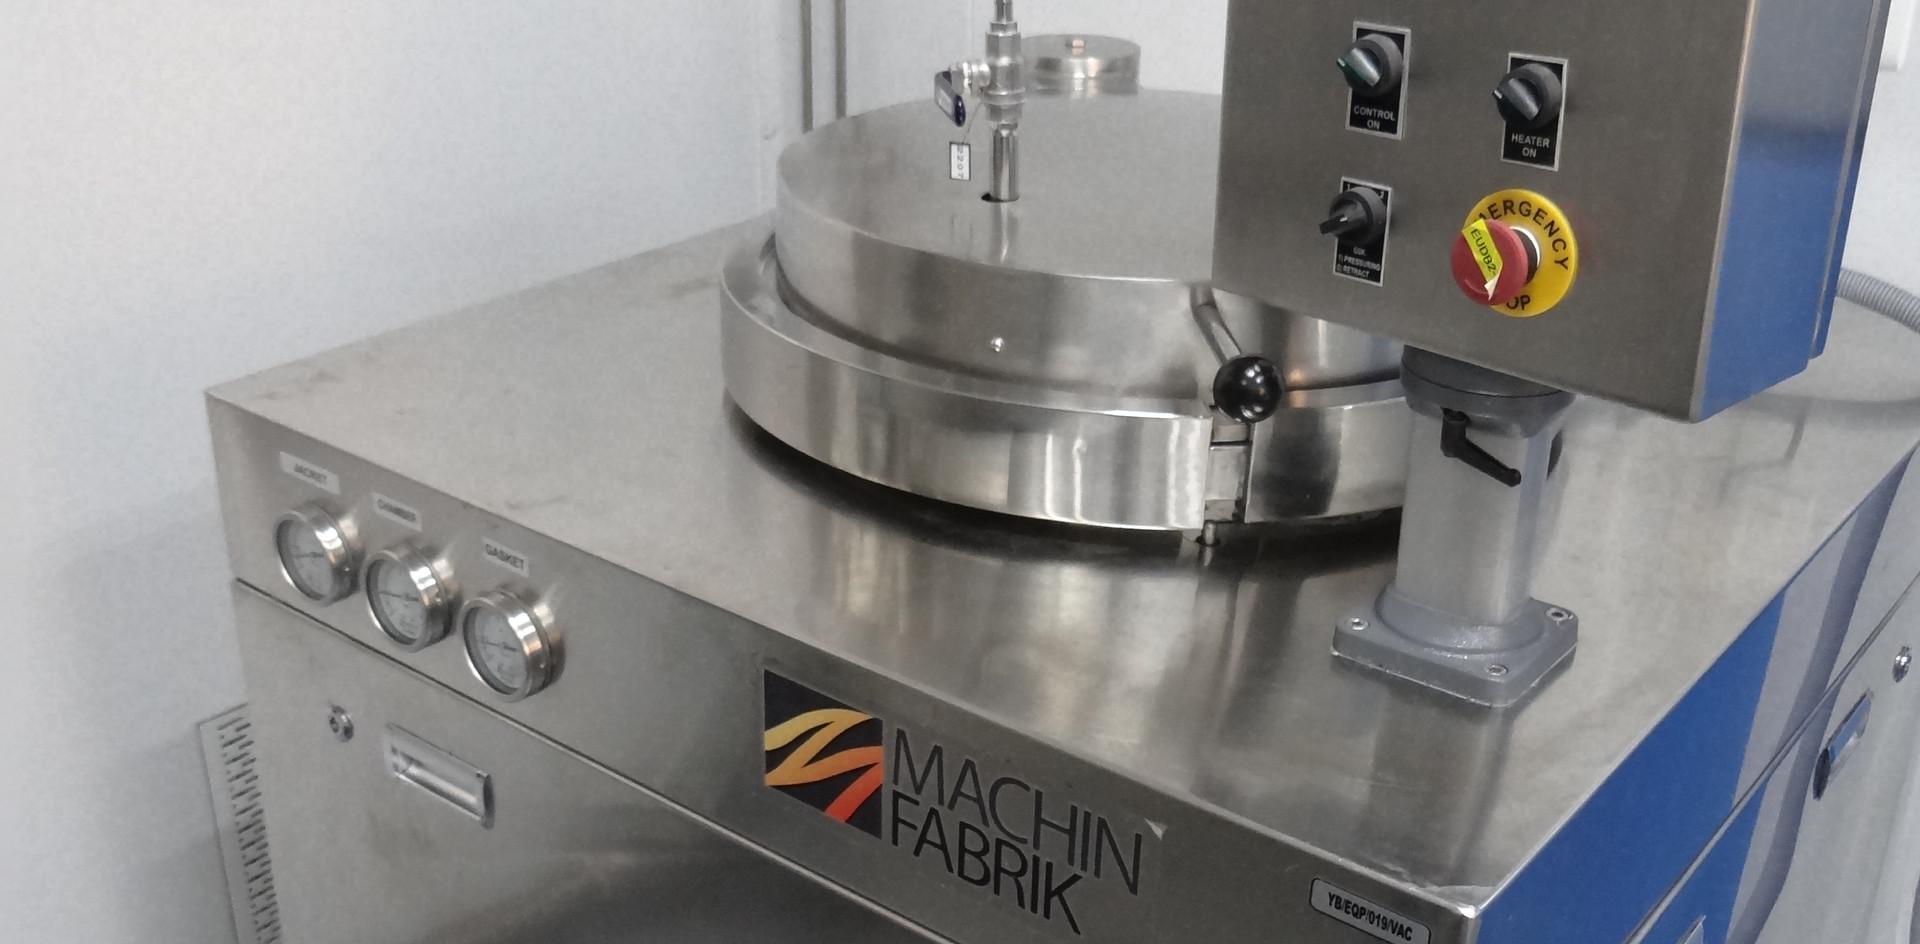 Decontamination Autoclave.JPG